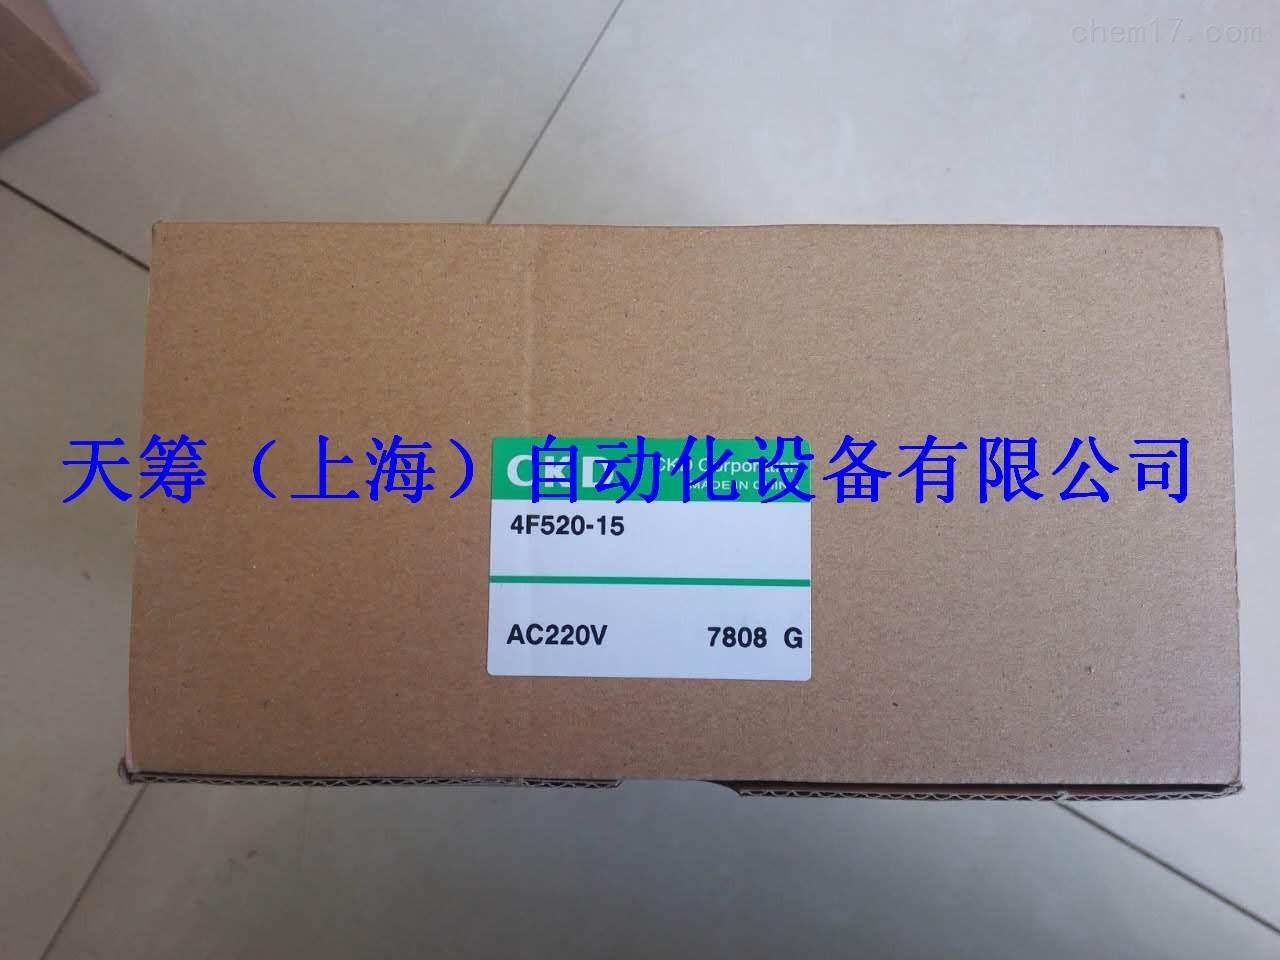 CKD流体阀4F520-15